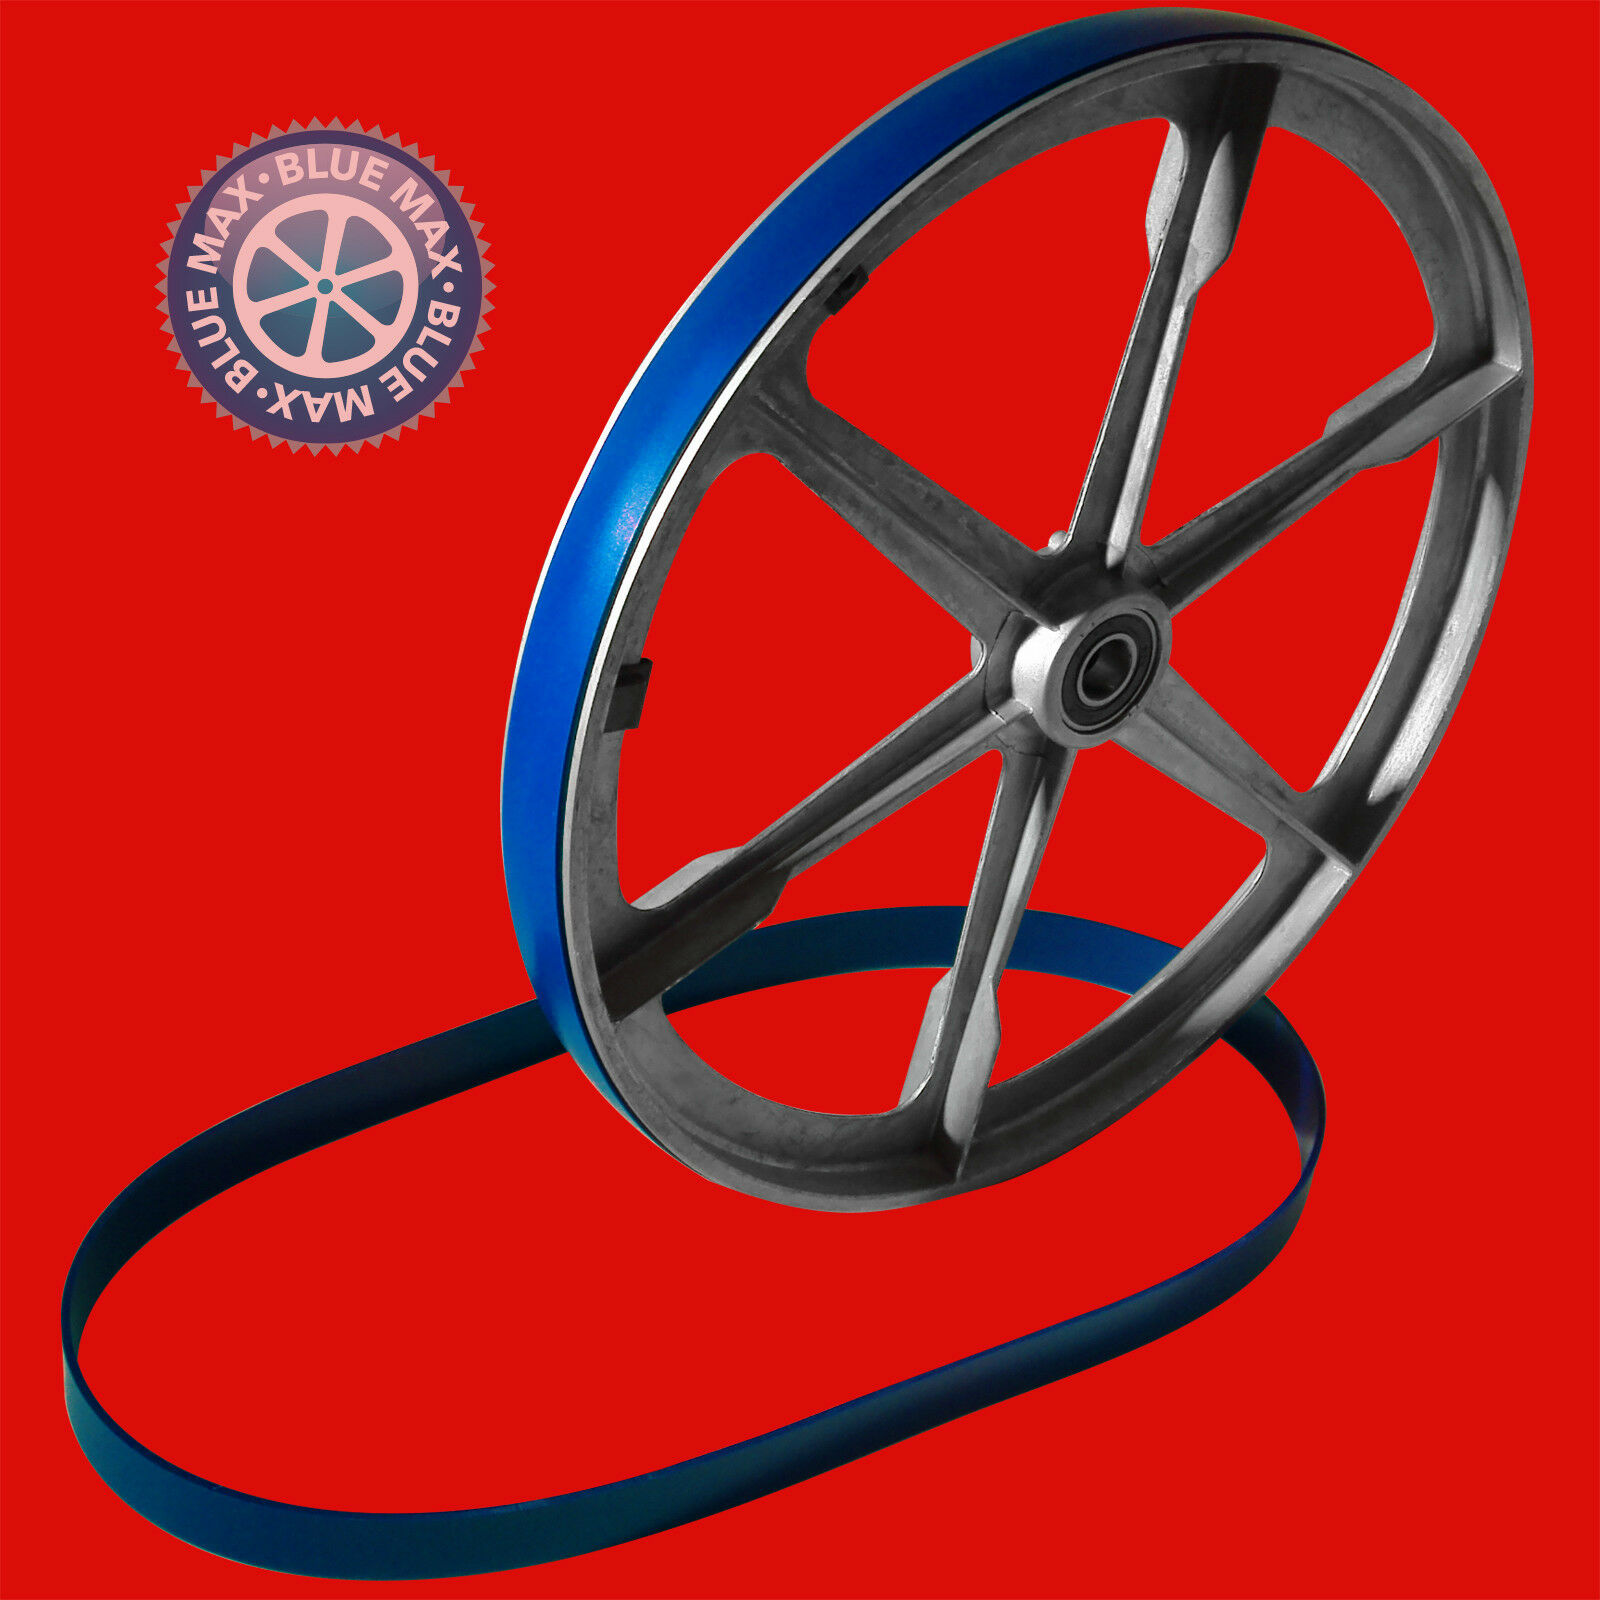 2 Blaues Max Ultra Uretano Cinta Sierra Neumáticos para Pioneer 48.3cm